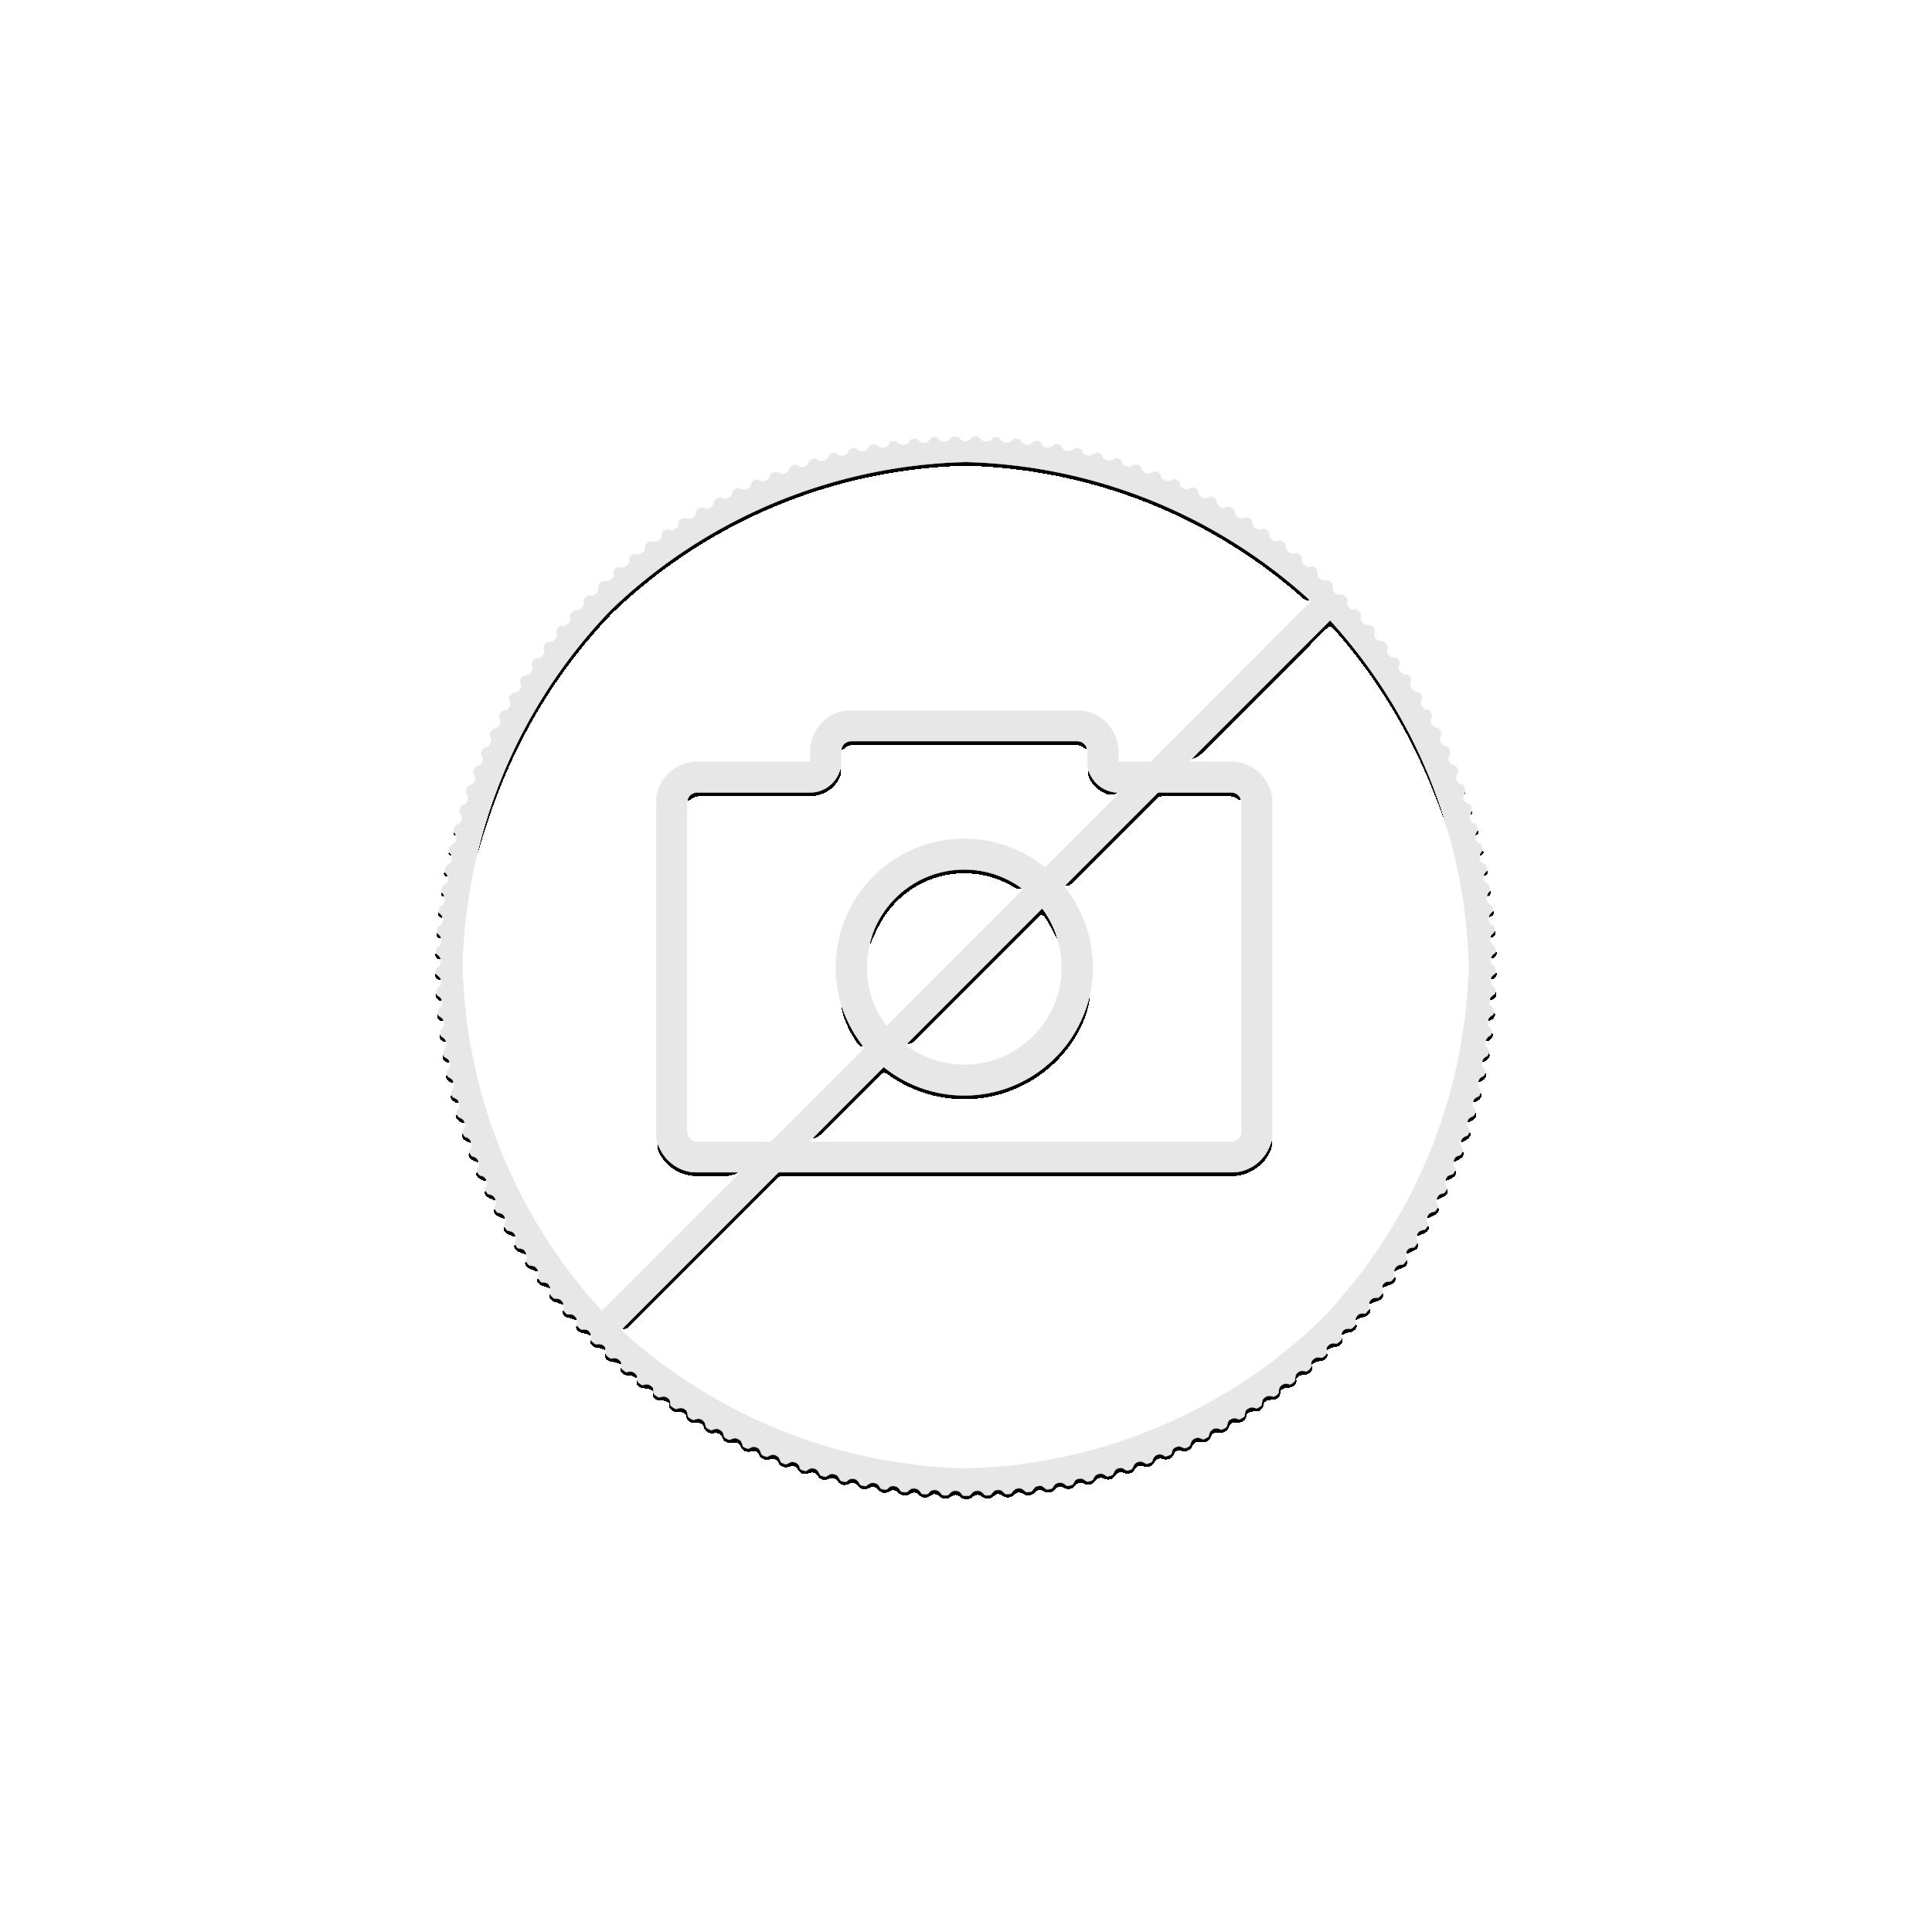 5 troy ounce zilveren munt geluksgoden Fu Lu Shou 2021